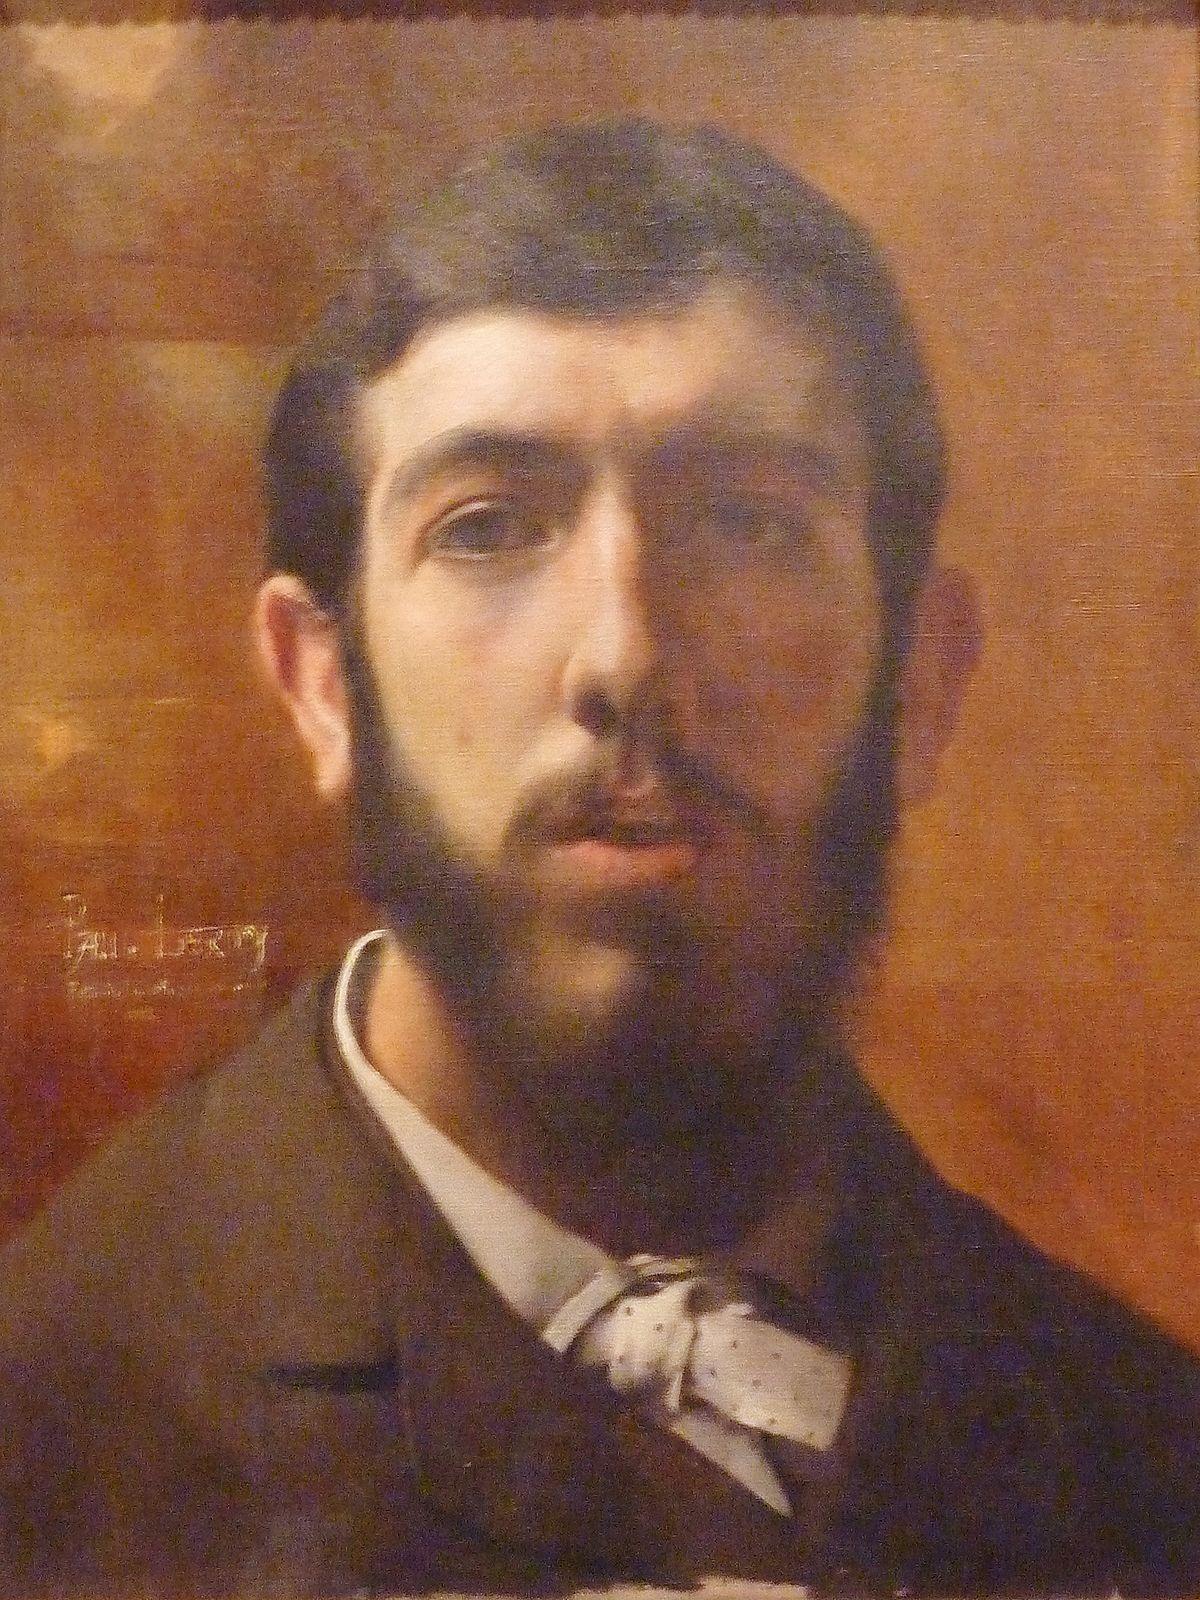 Paul Leroy peintre  Wikipdia